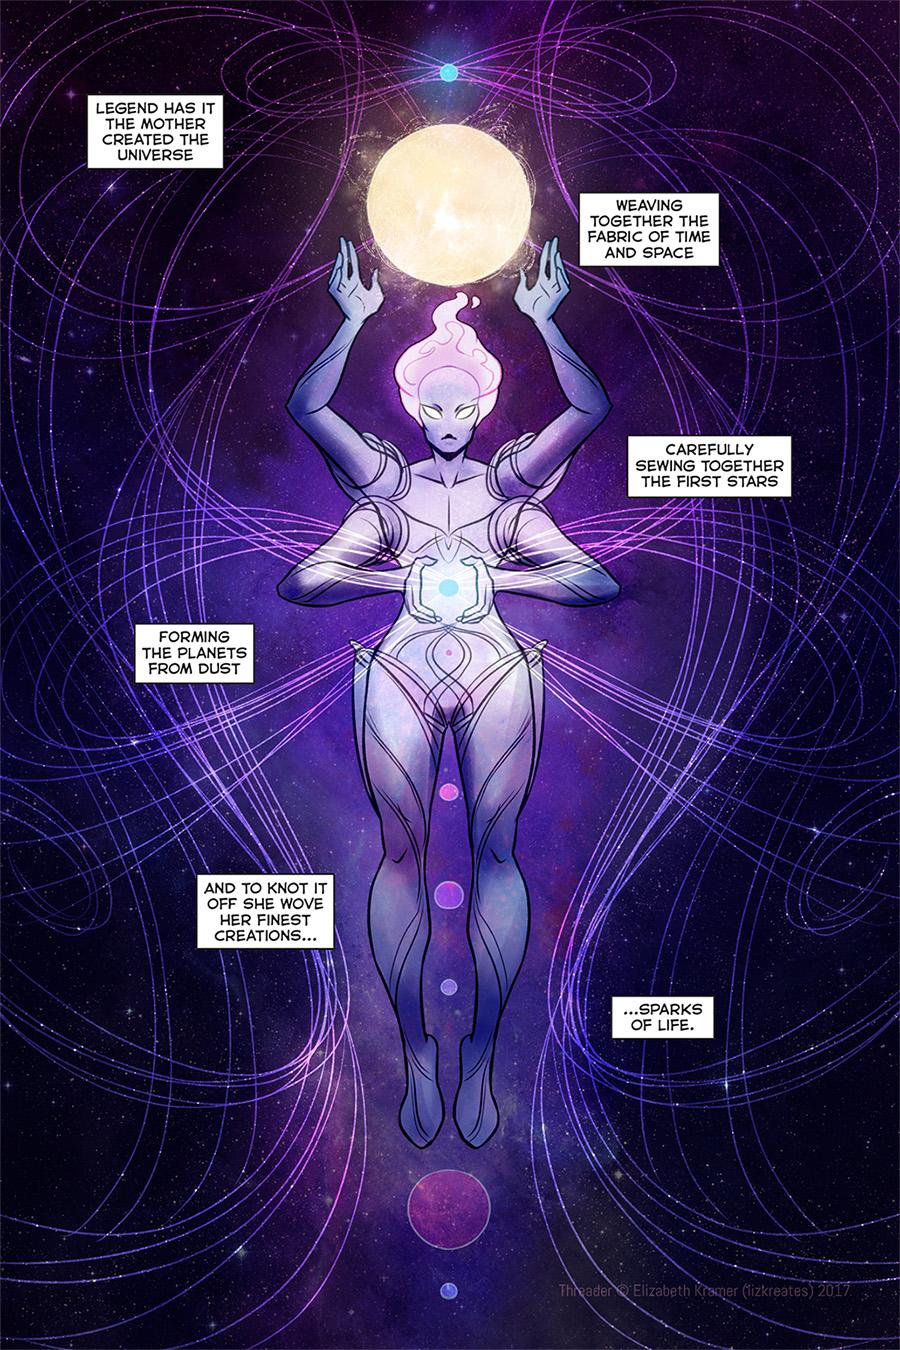 Cosmic mom